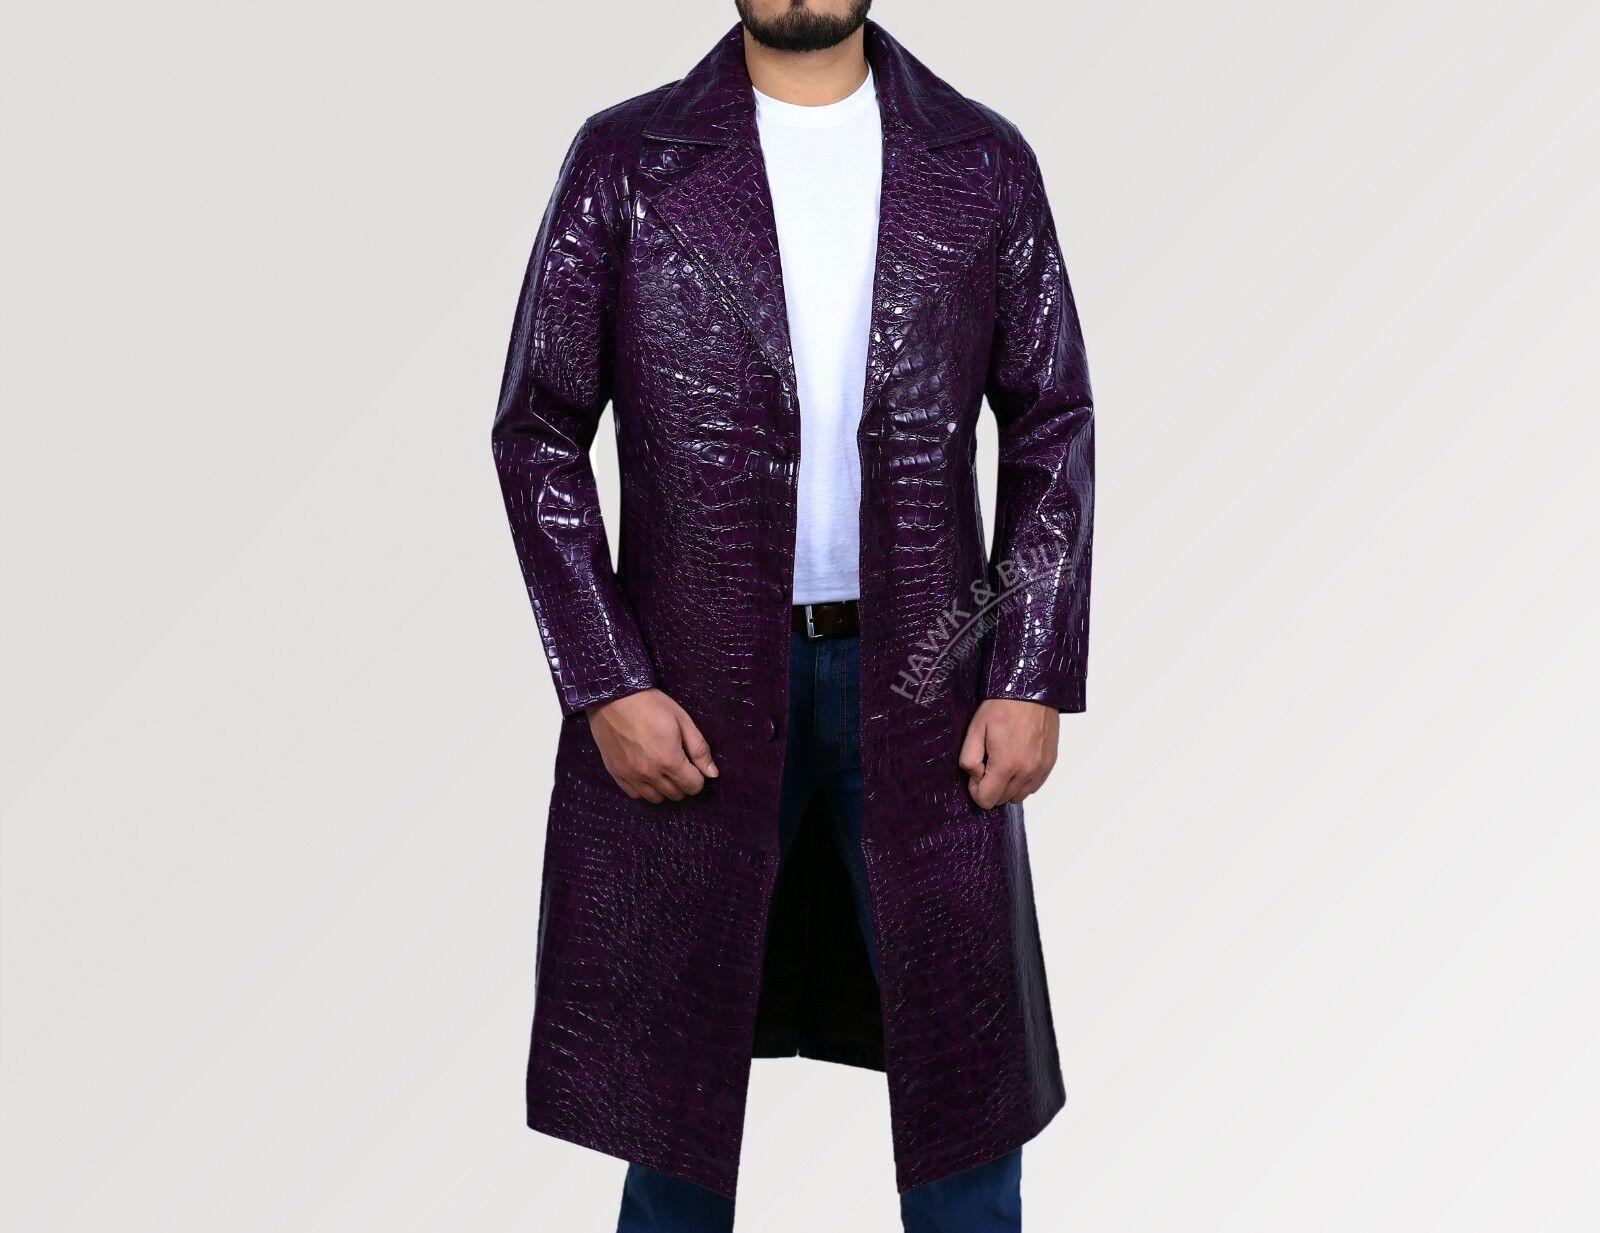 JaROT Leto Joker Suicide Squad lila Halloween Costume trench Coat Faux Leder